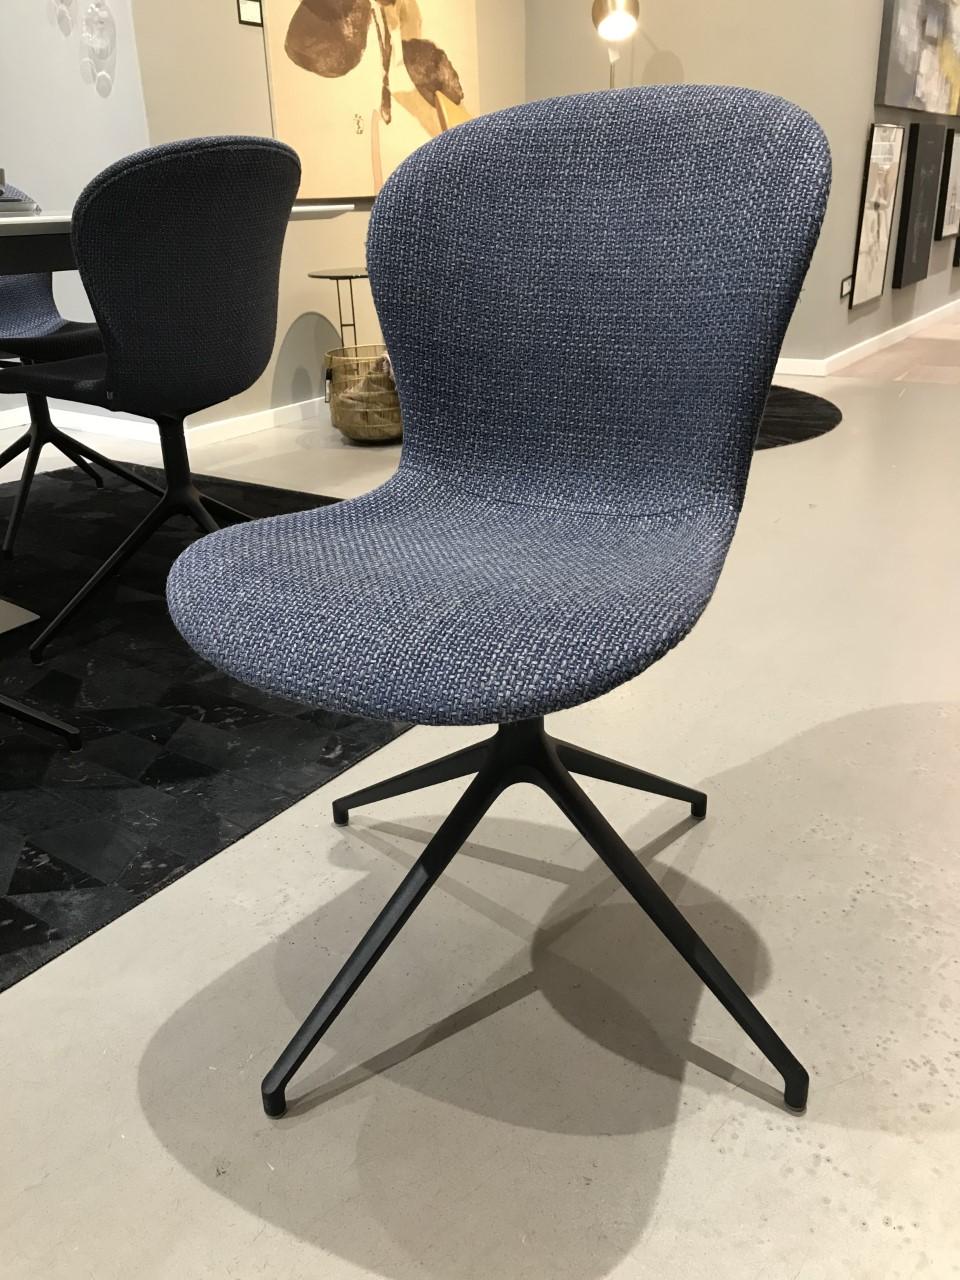 Adelaide Stuhl mit Drehfunktion 4x verfügbar Preis pro Stuhl